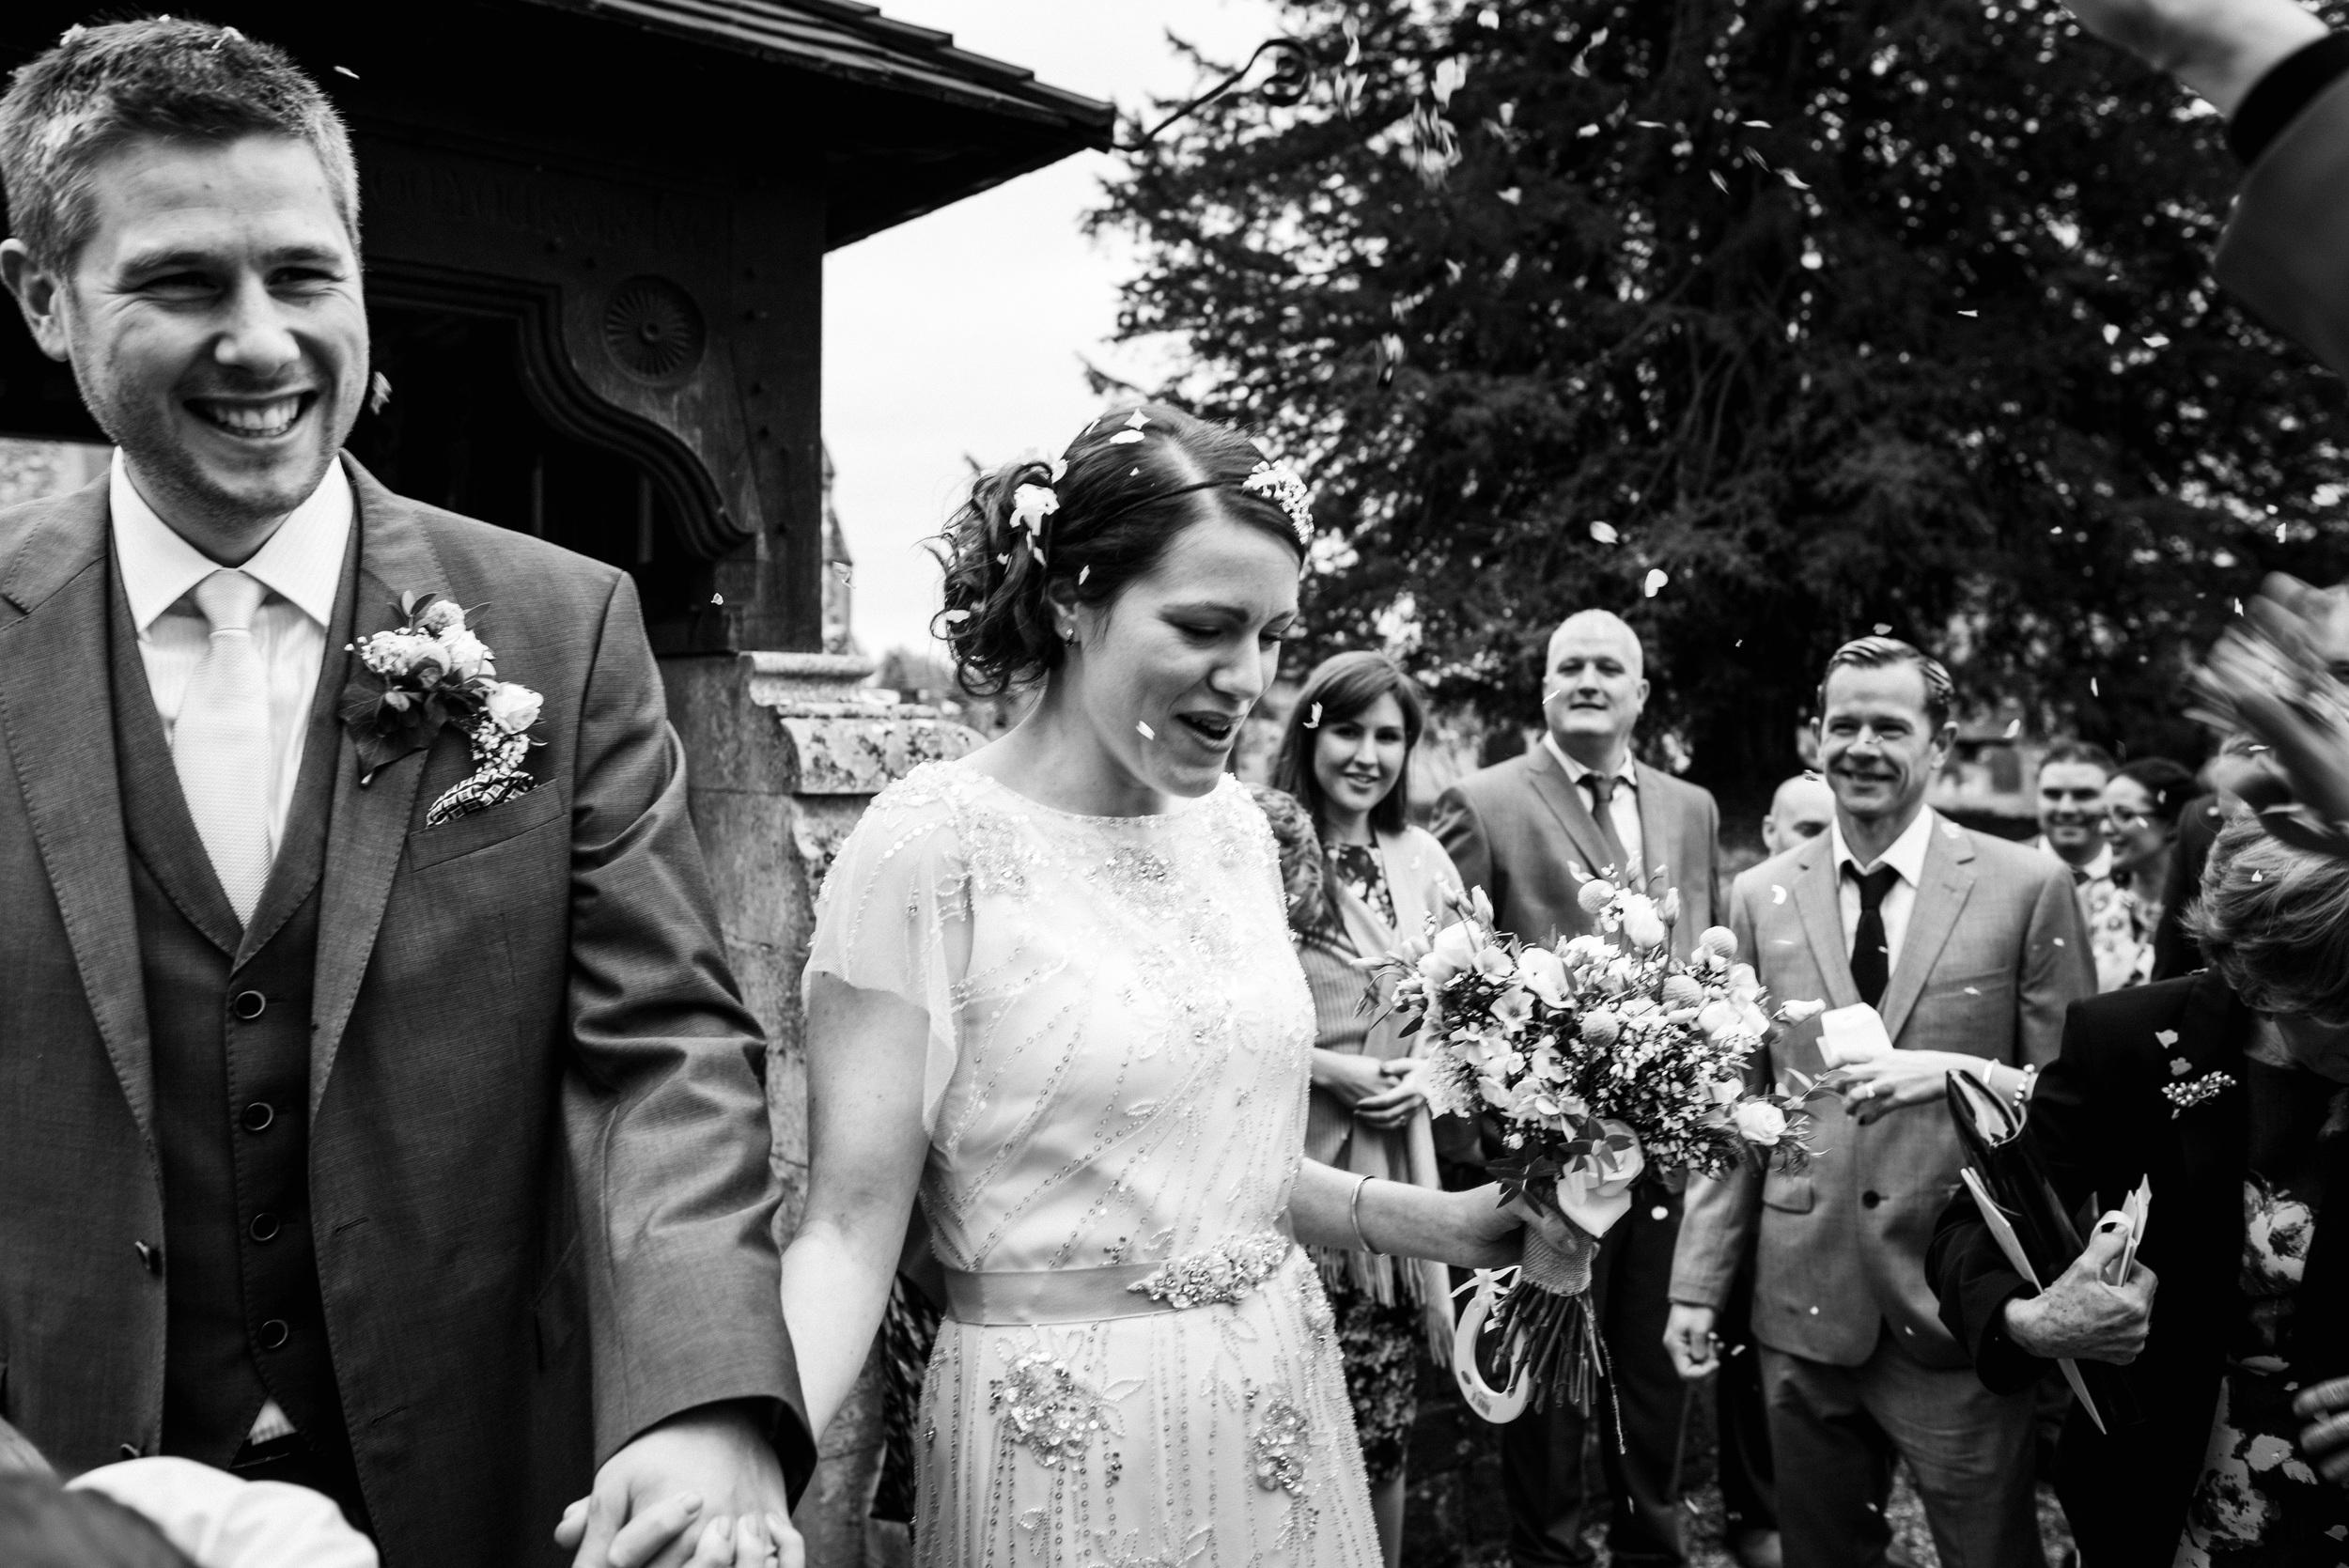 Michelle & James wedding photos-174.jpg